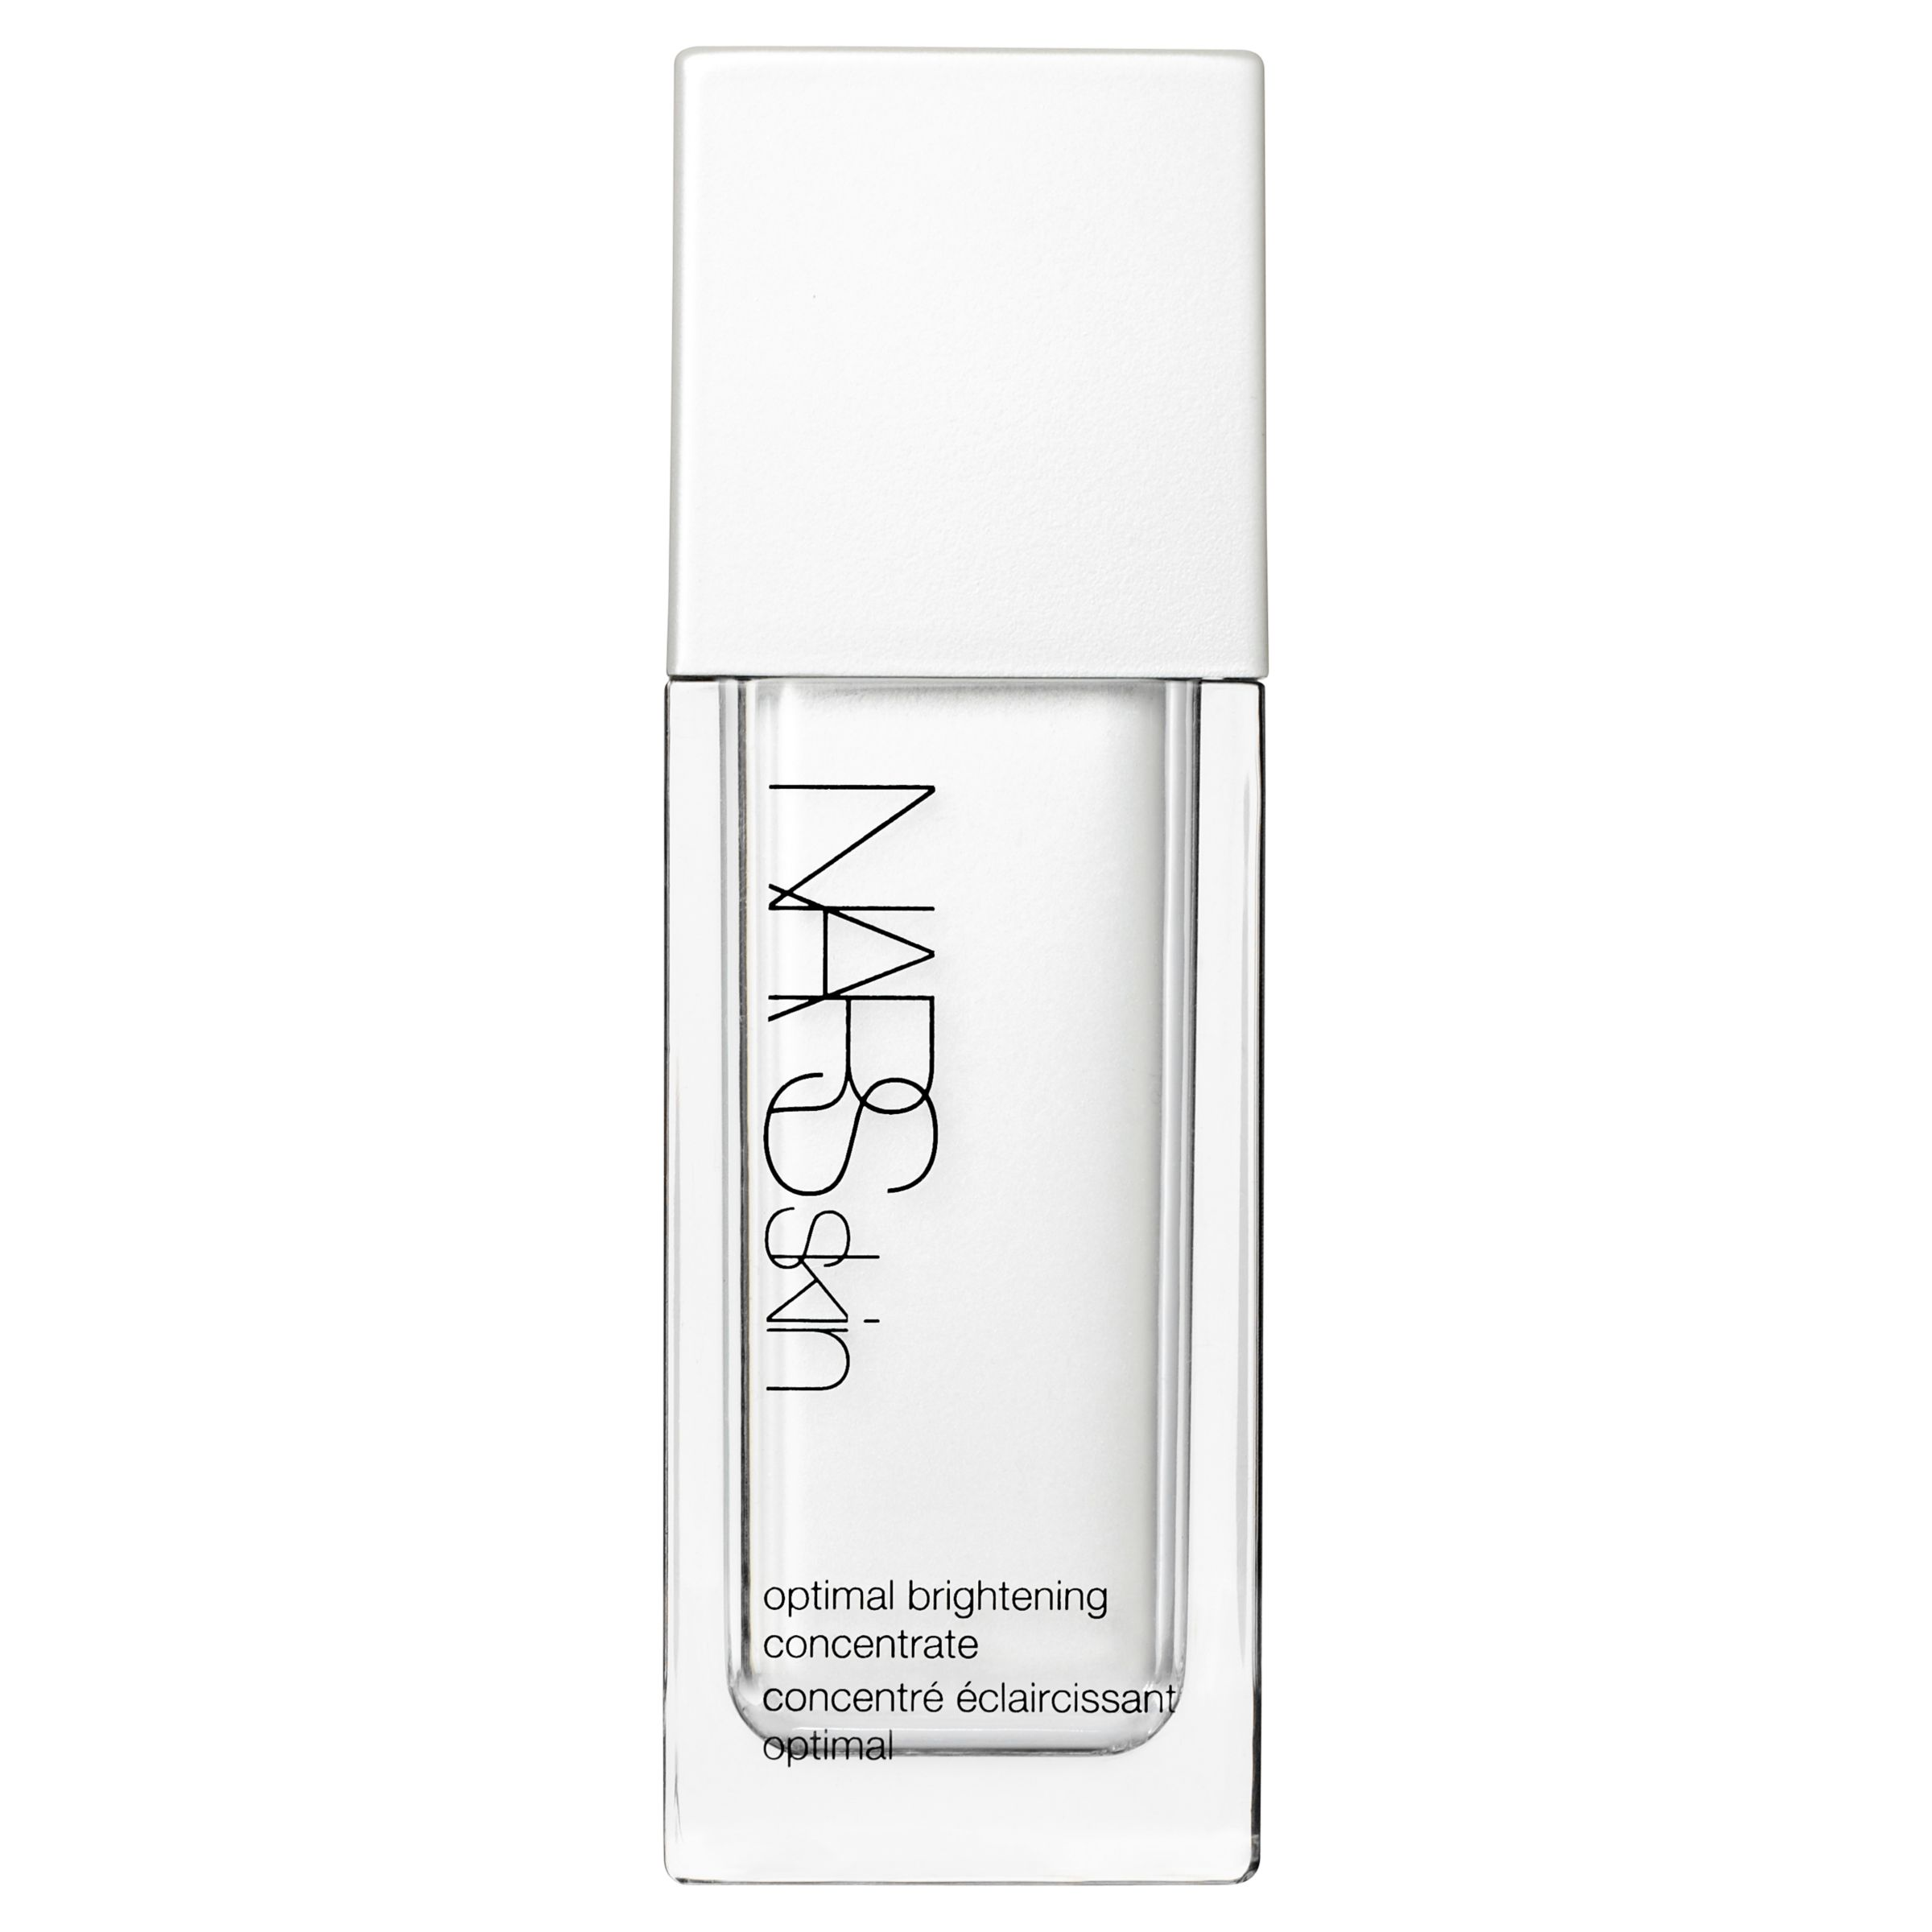 NARS NARSskin Optimal Brightening Concentrate Serum, 30ml